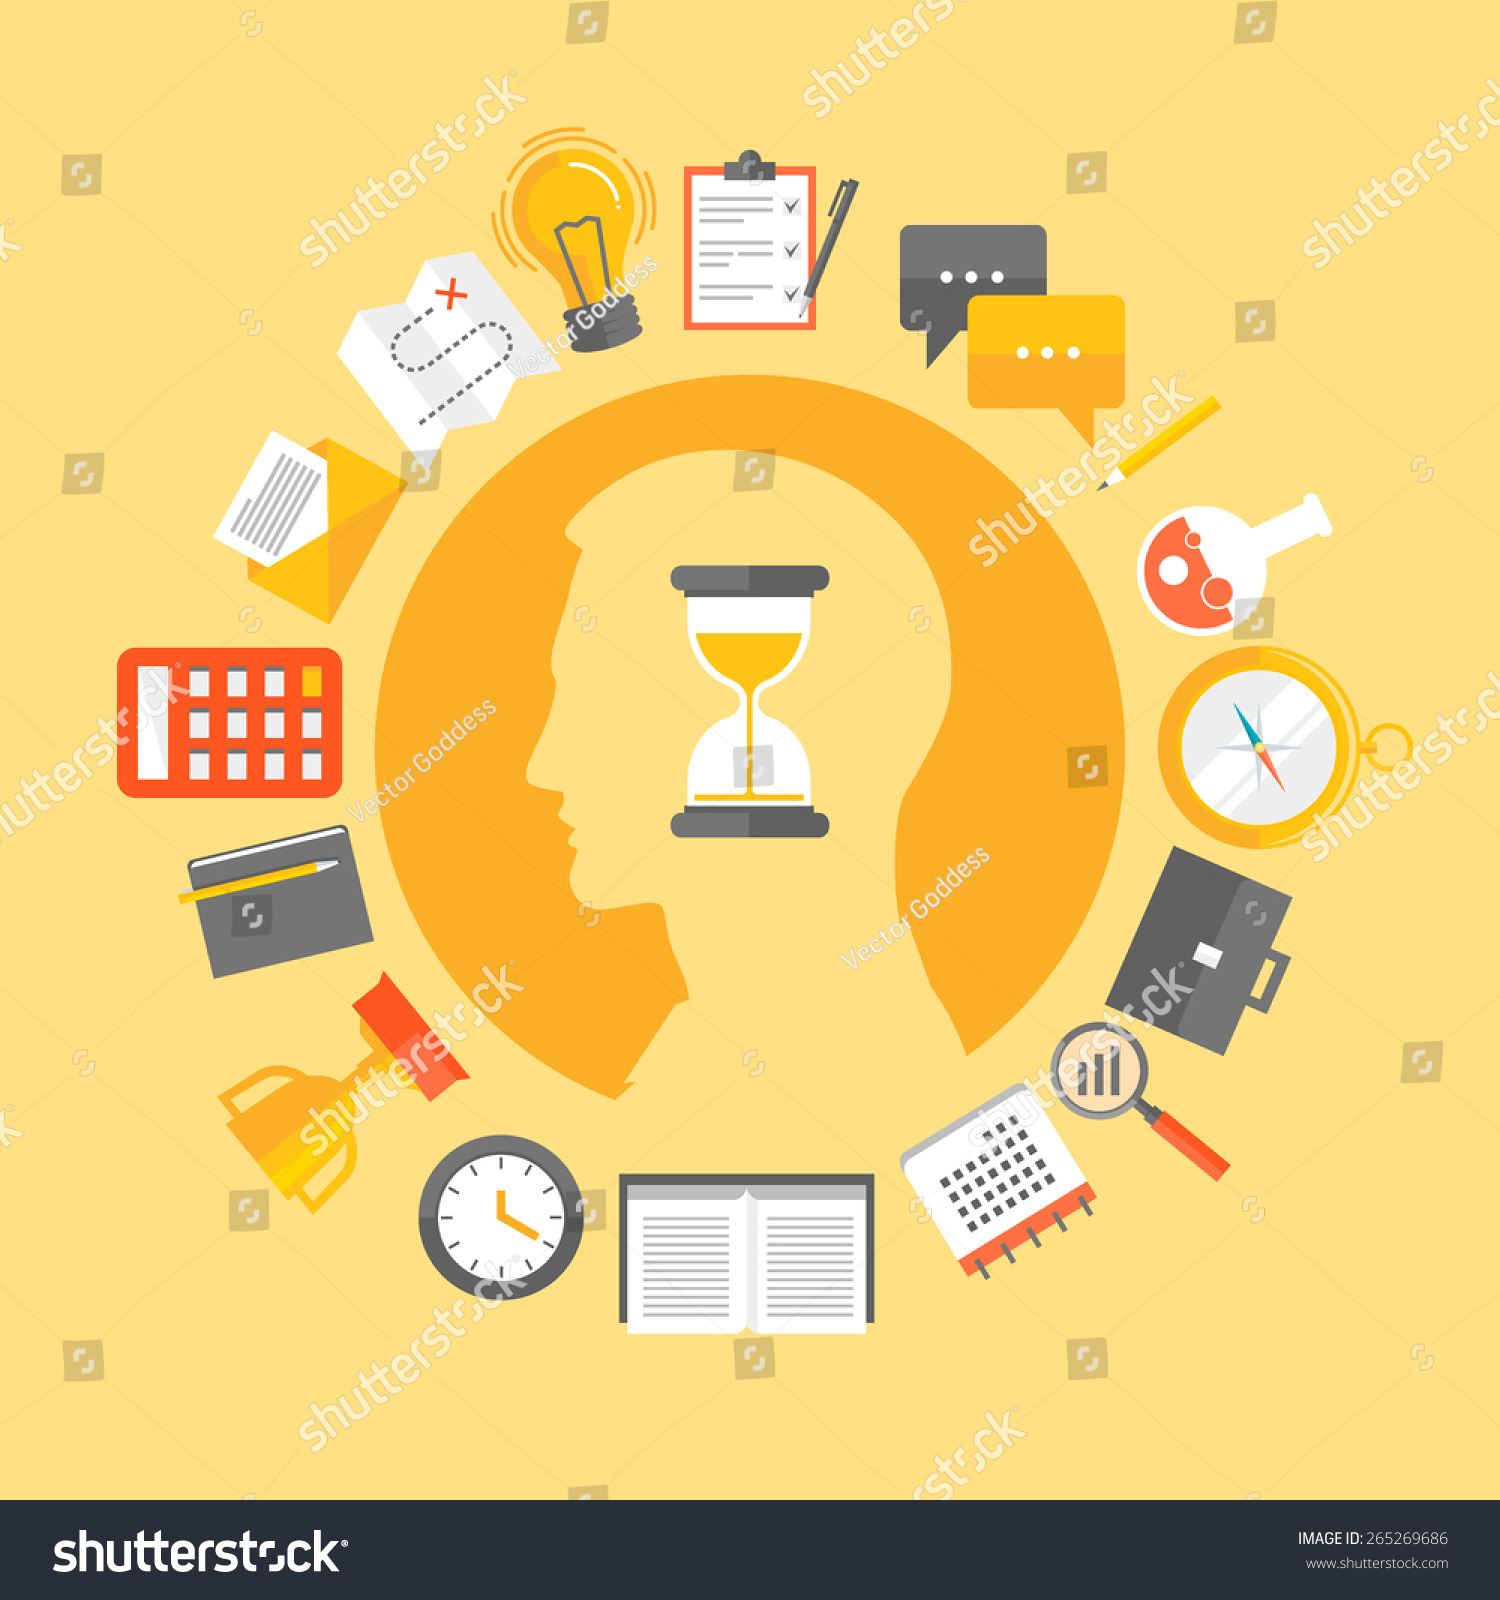 Flat Design Vector Illustration Concept Productivity Stock Vector